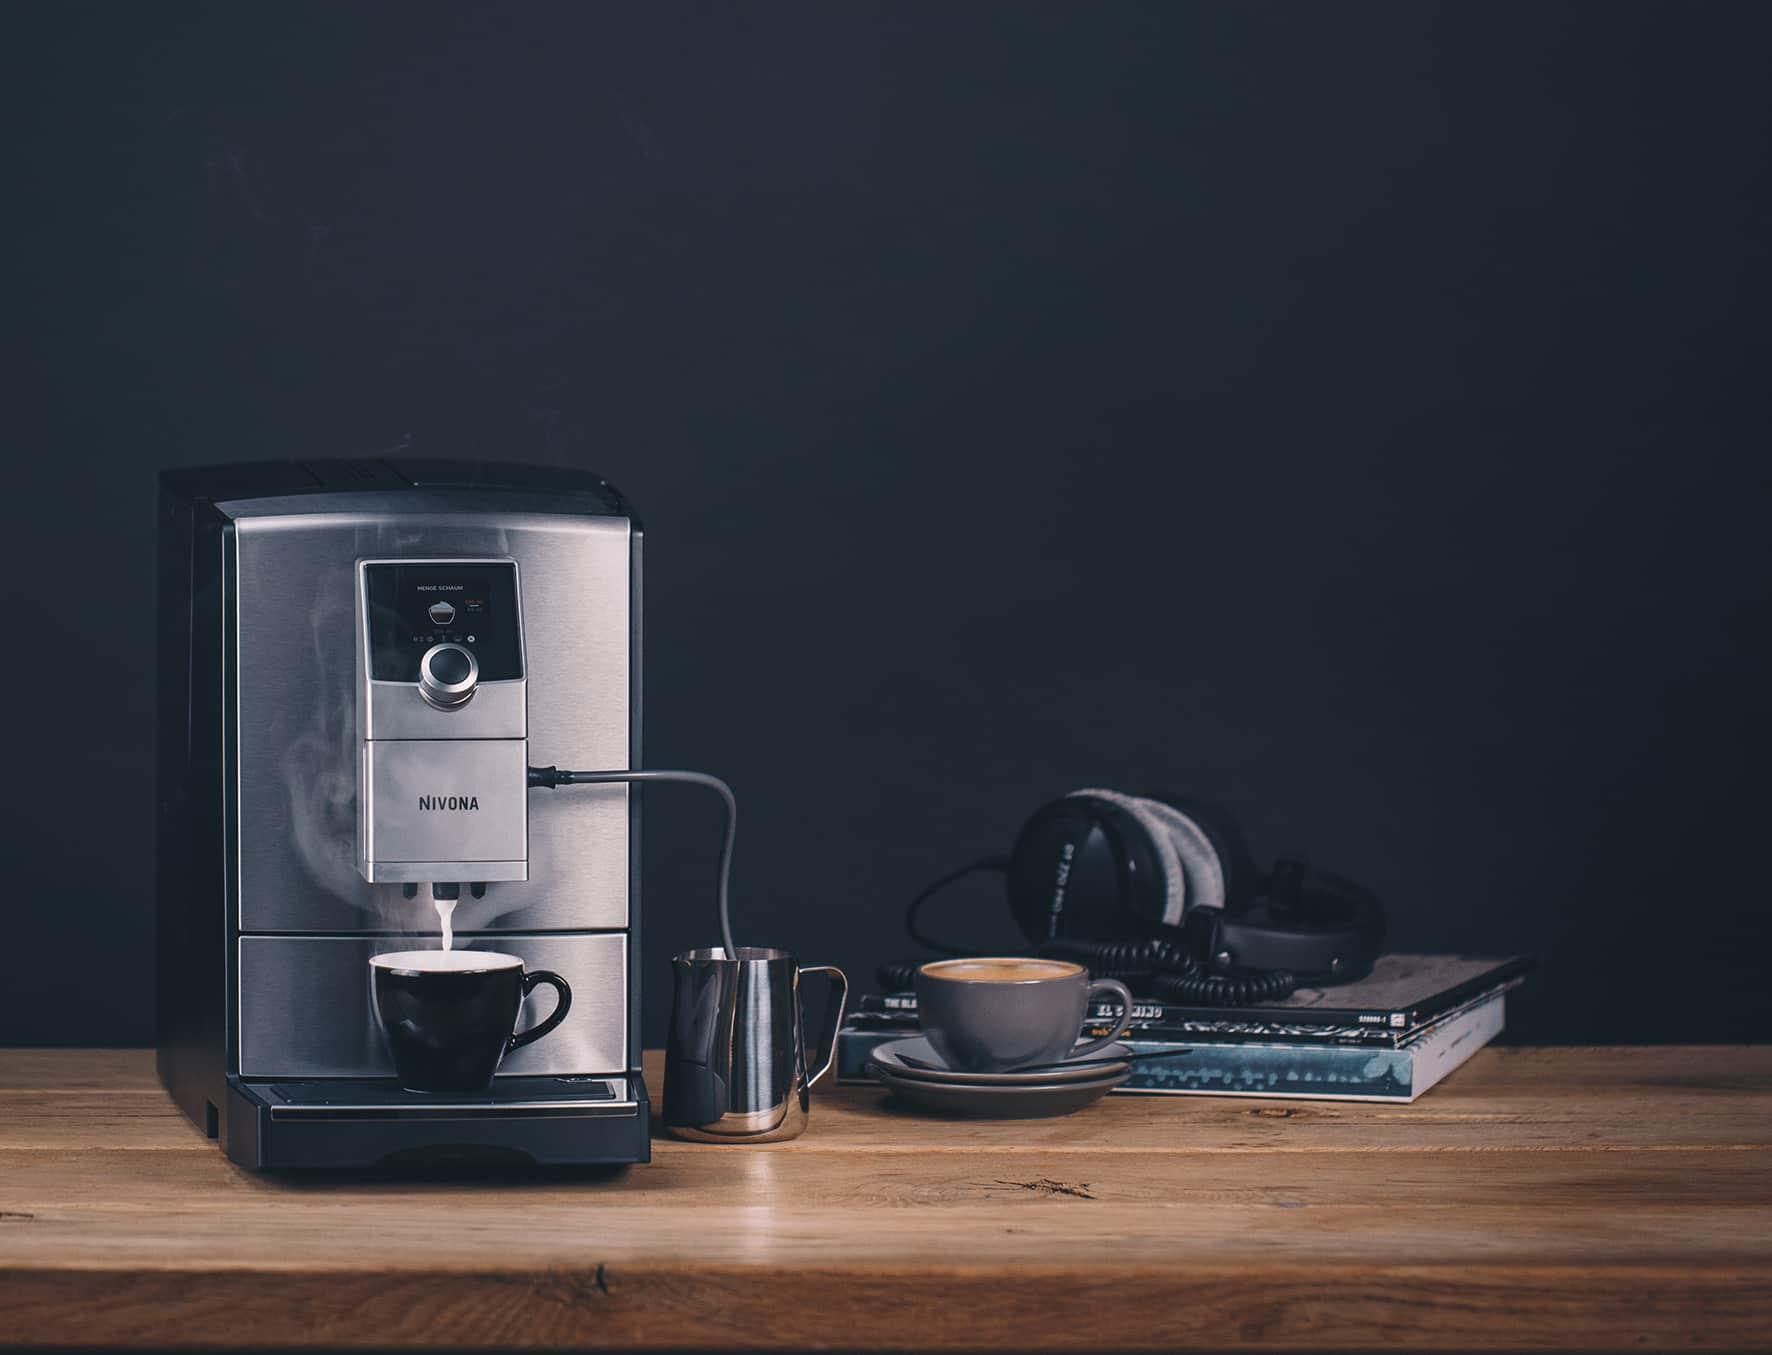 CafeRomatica NICR 799 NIVONA